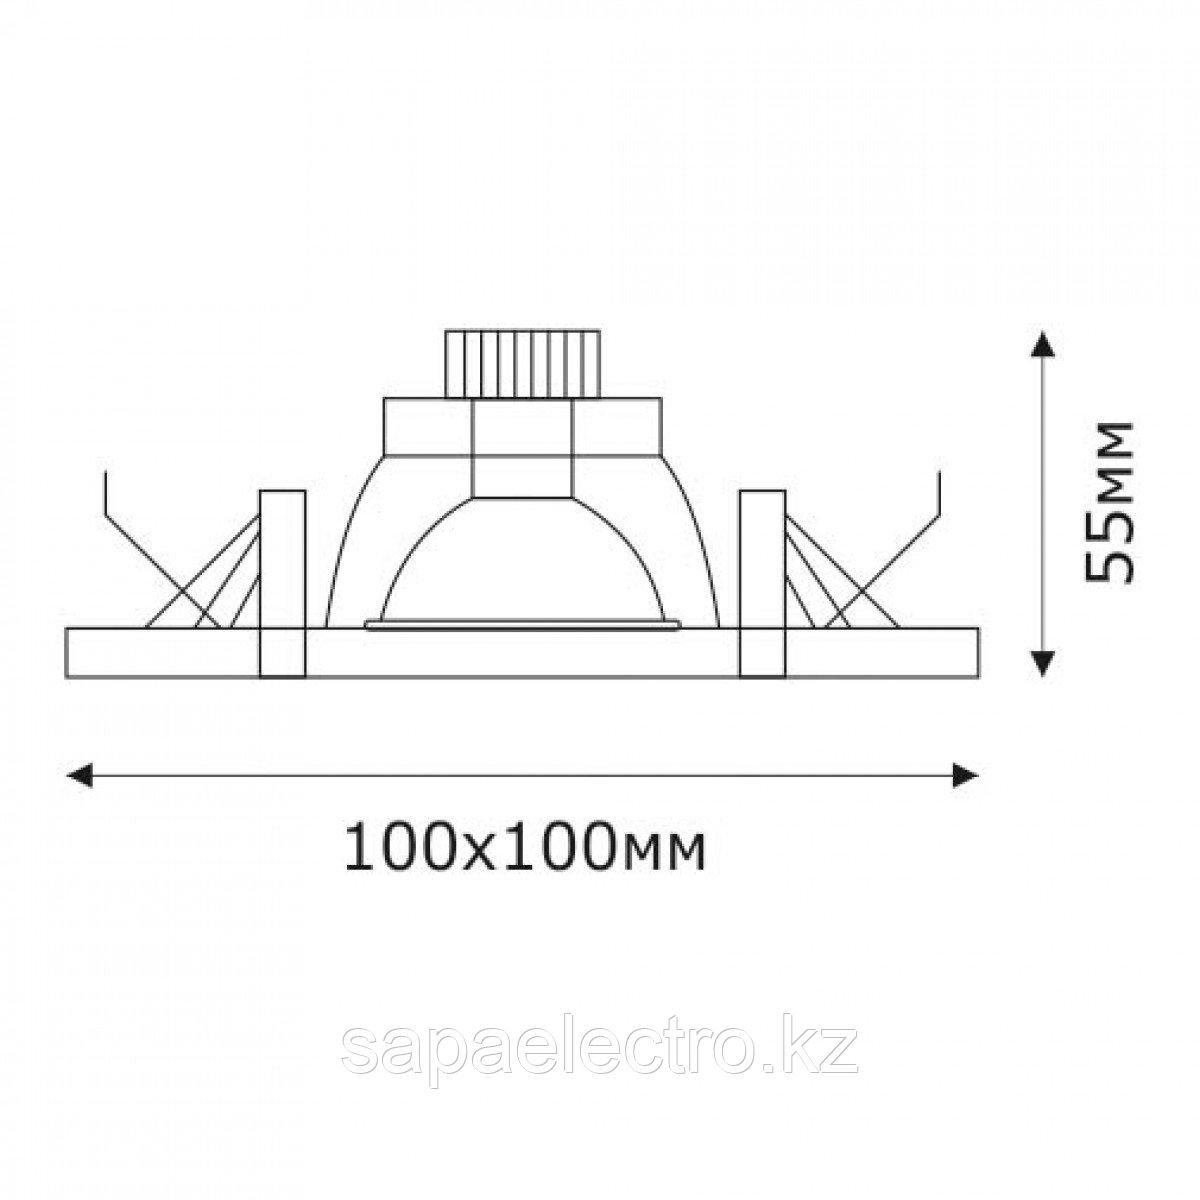 Спот LED SPD-X30T SQUARE 3W 5000K (TS) 60ш